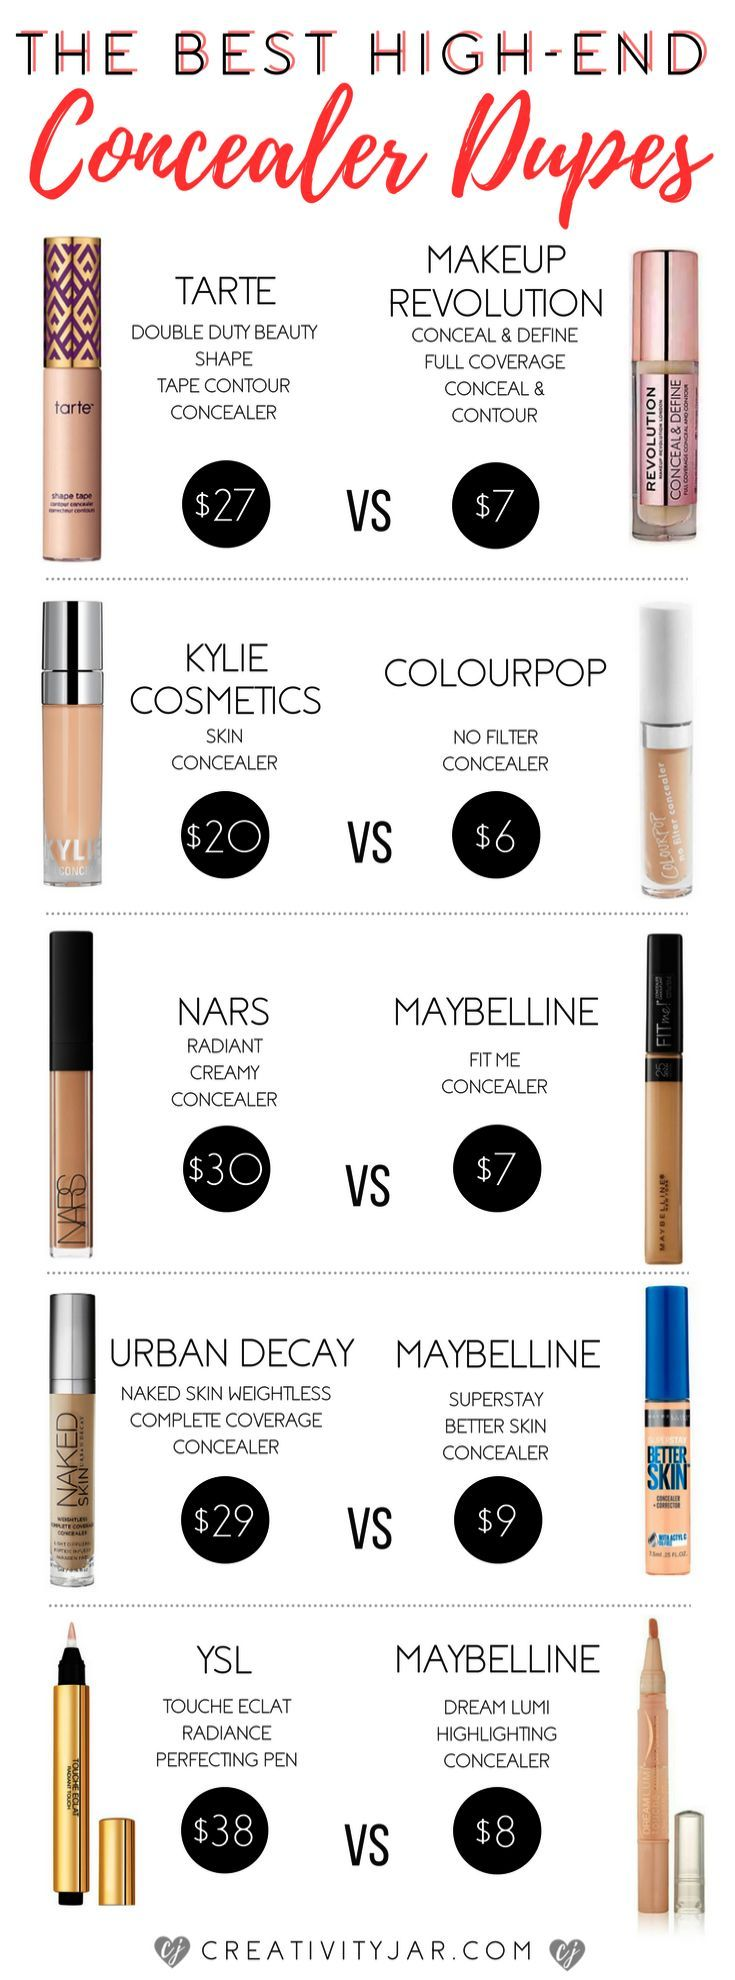 Makeup Dupe Malaysia Makeup Dupe For Tarte Foundation Makeup Dupes Drugstore Makeup Dupes Best Makeup Products